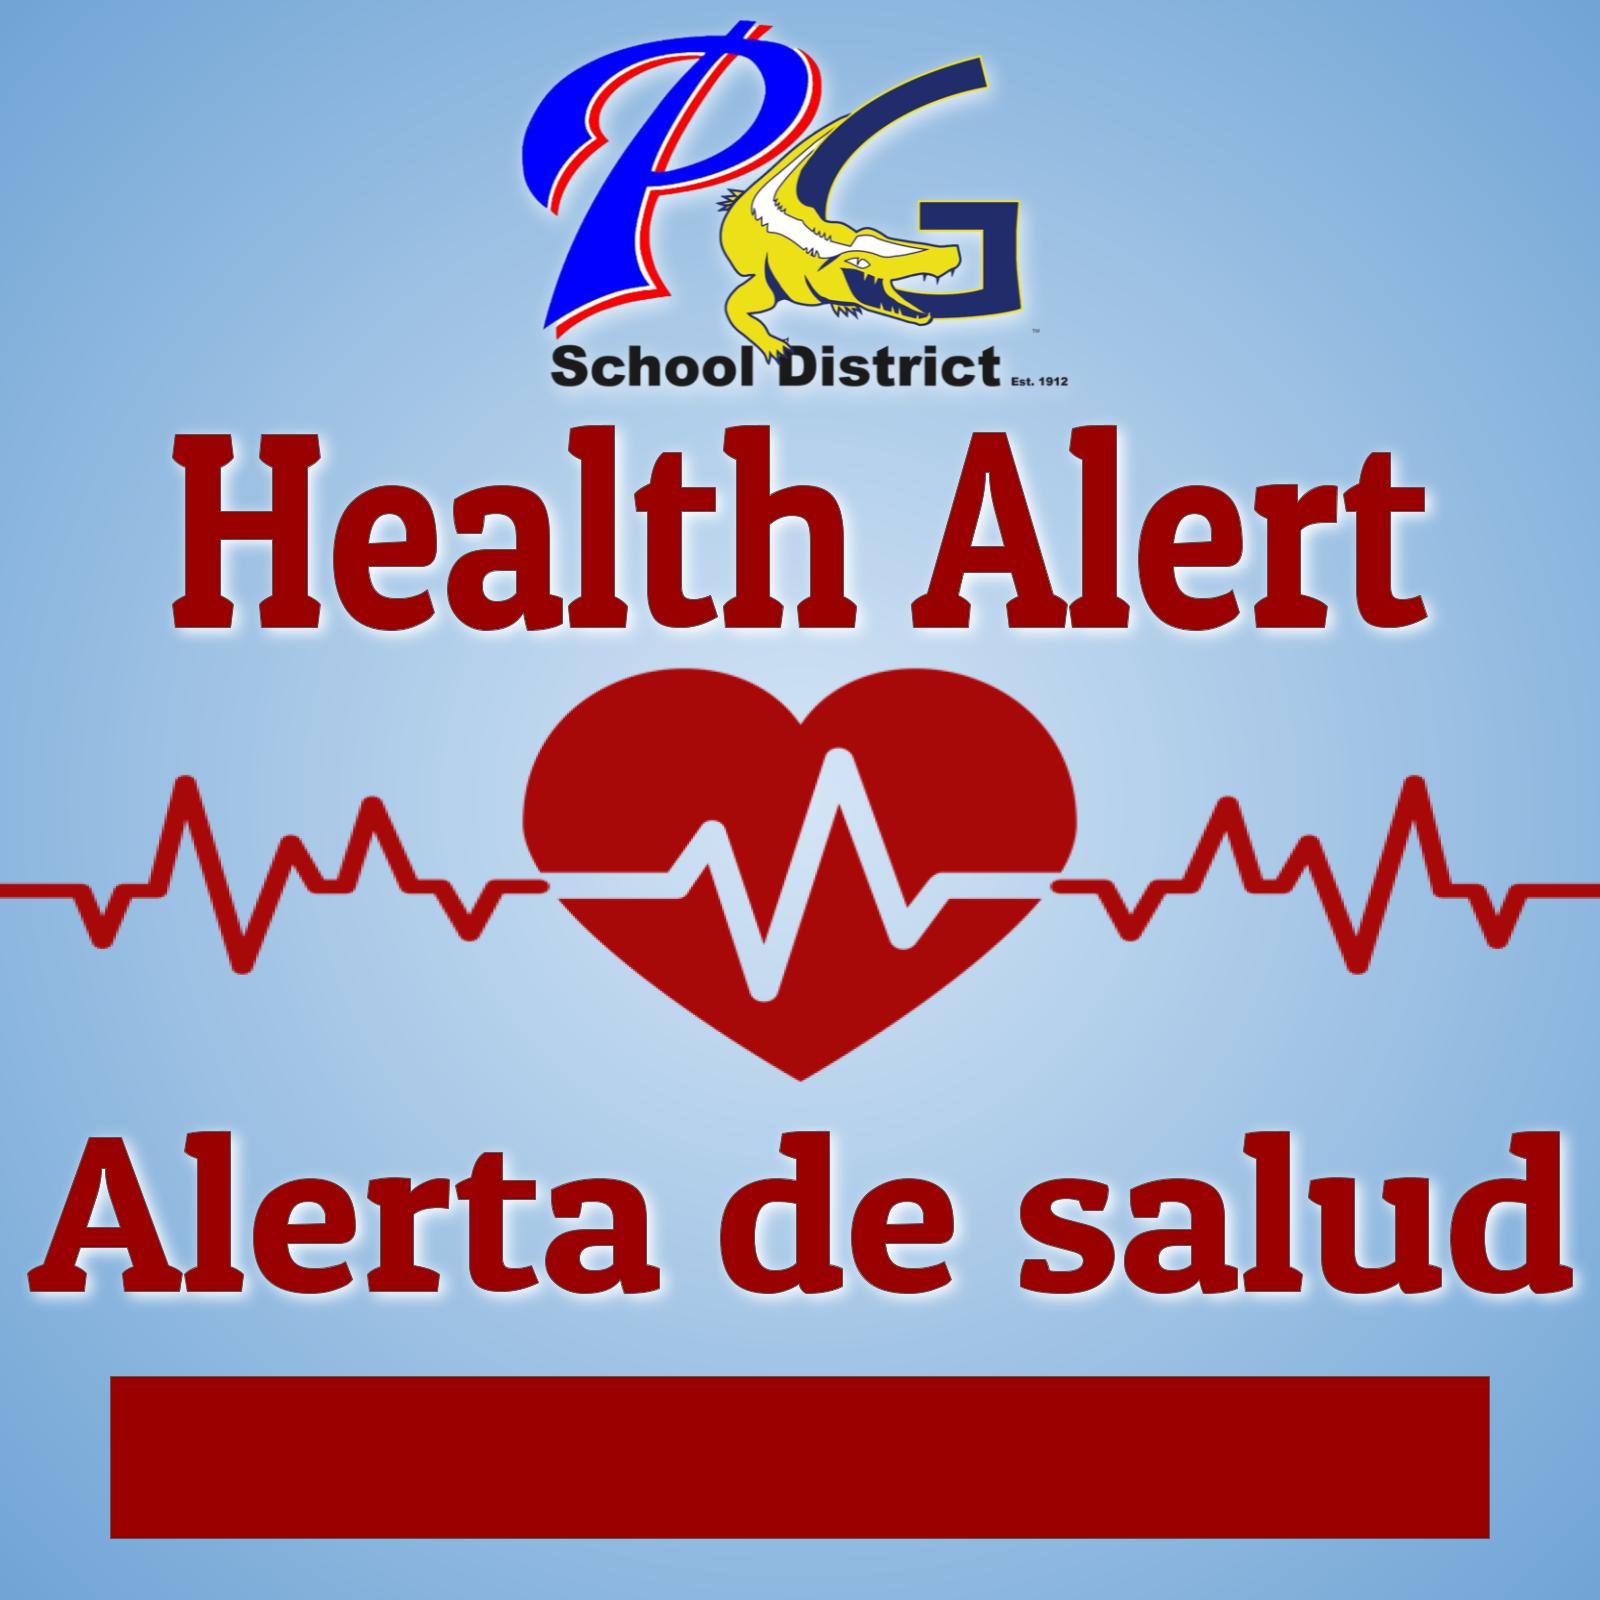 Health Alert.  Alerta de salud